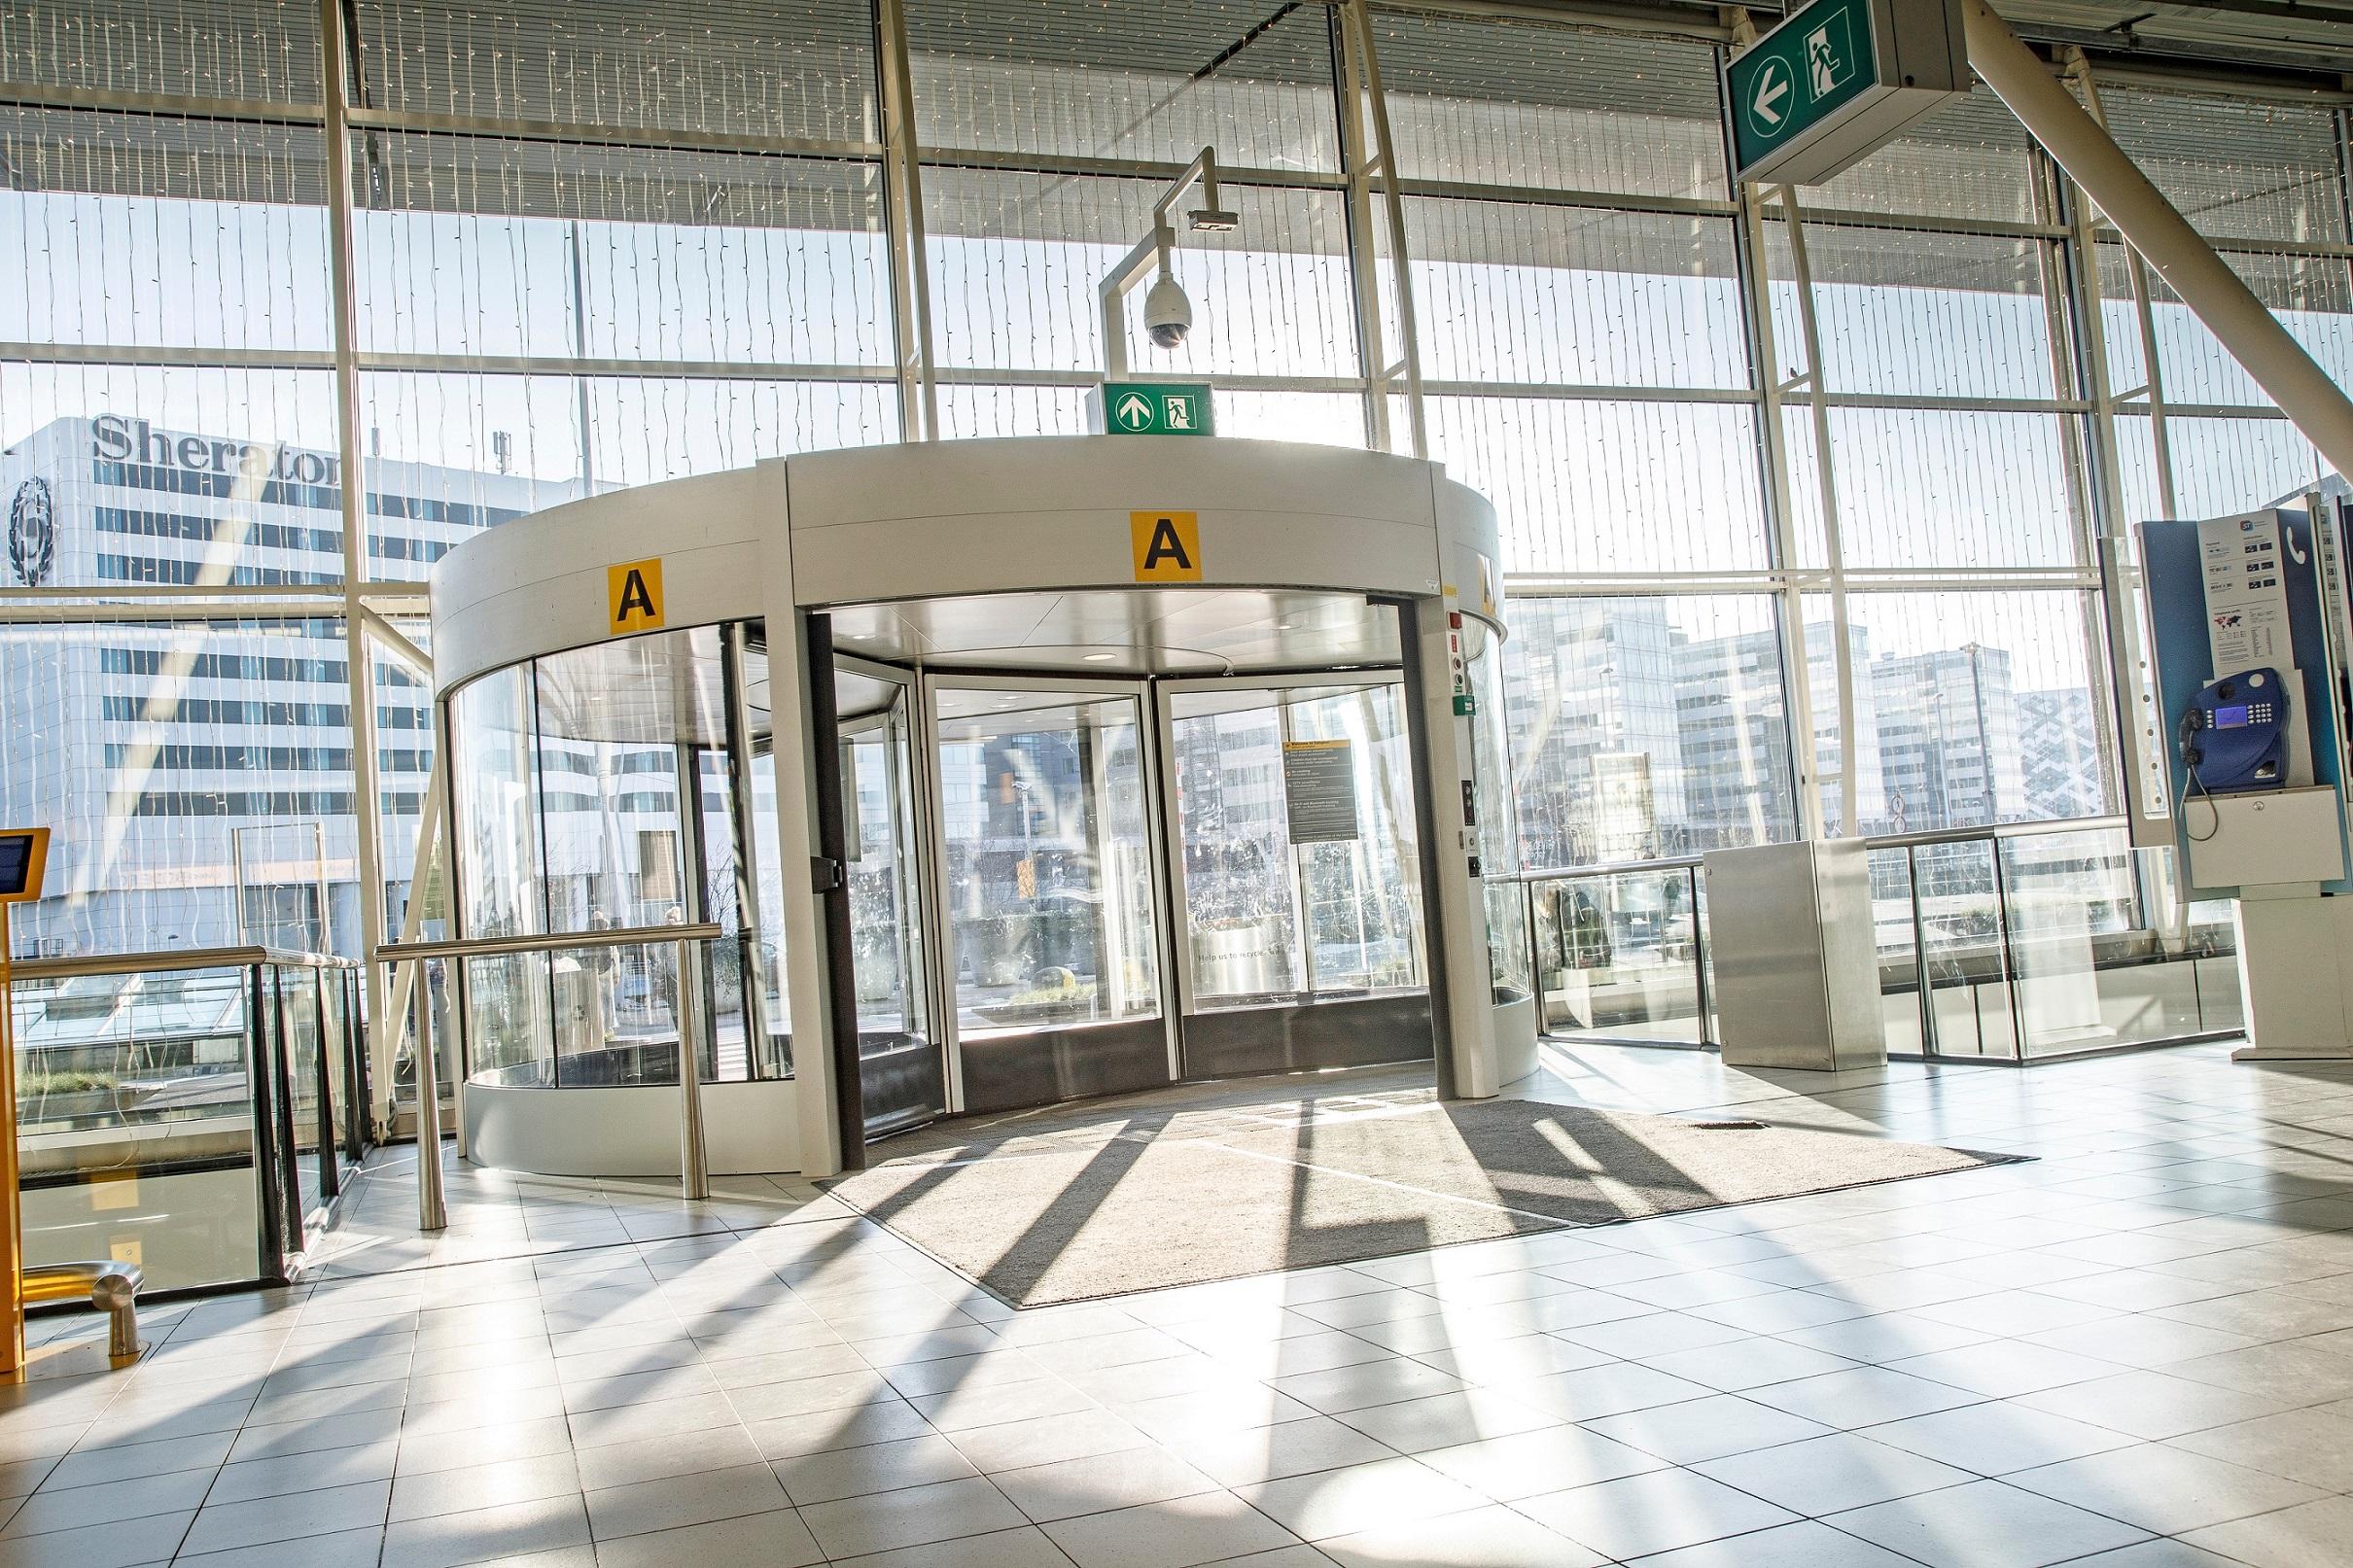 Automatic Revolving Door at Airport